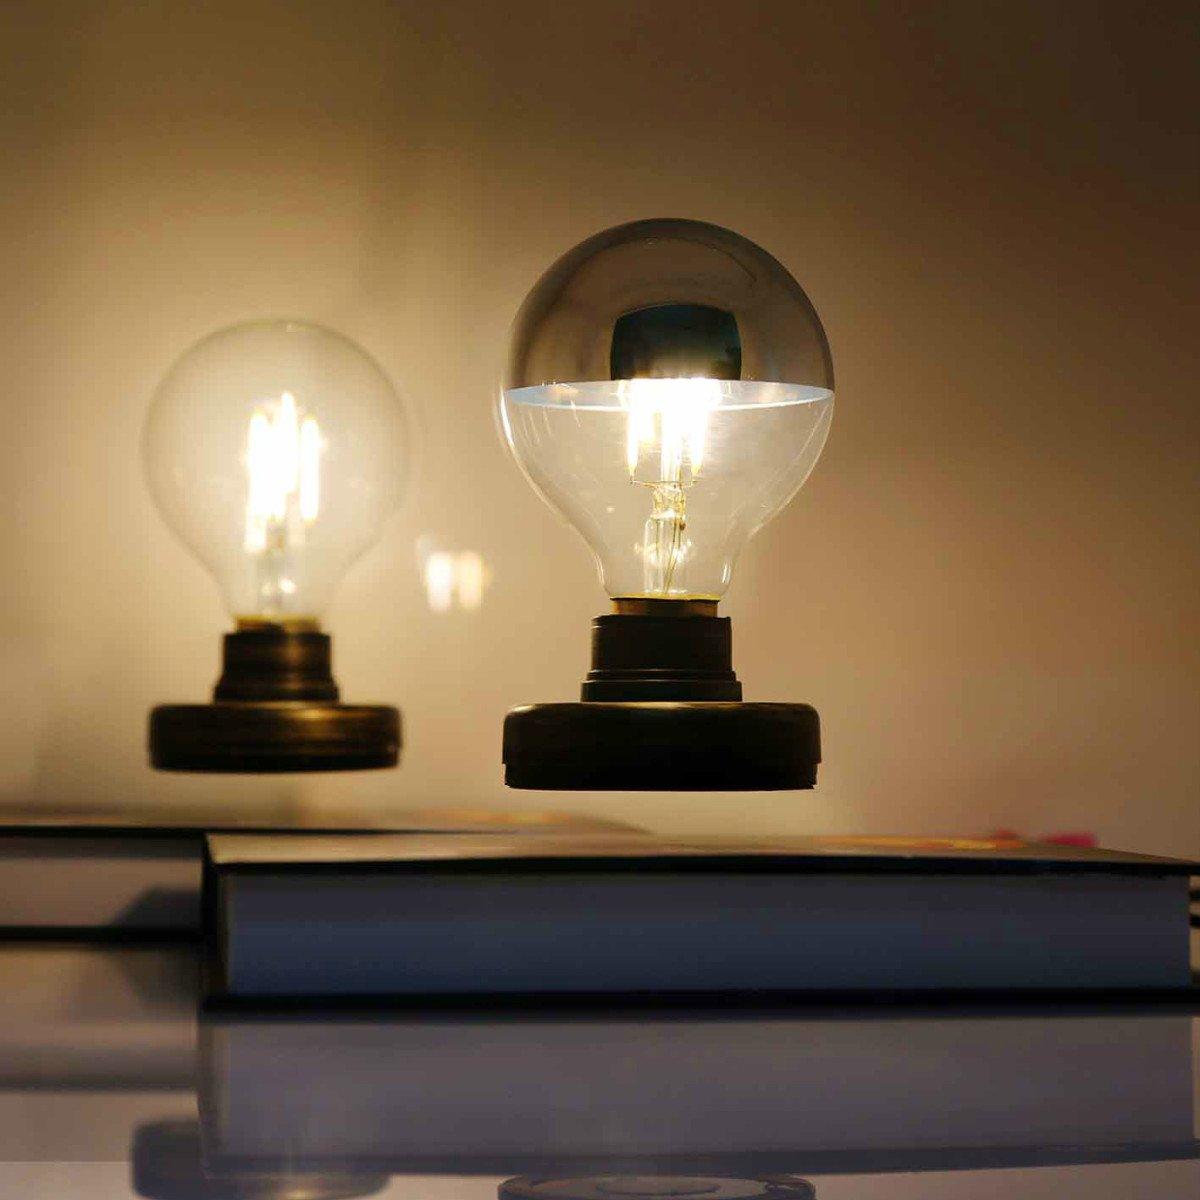 Levitating Light Bulb Lamp Magnetic Levitating Floating Light Bulb with Wireless Gifts, Room Decor, Night Light, Home Office Decor Desk Tech Toys